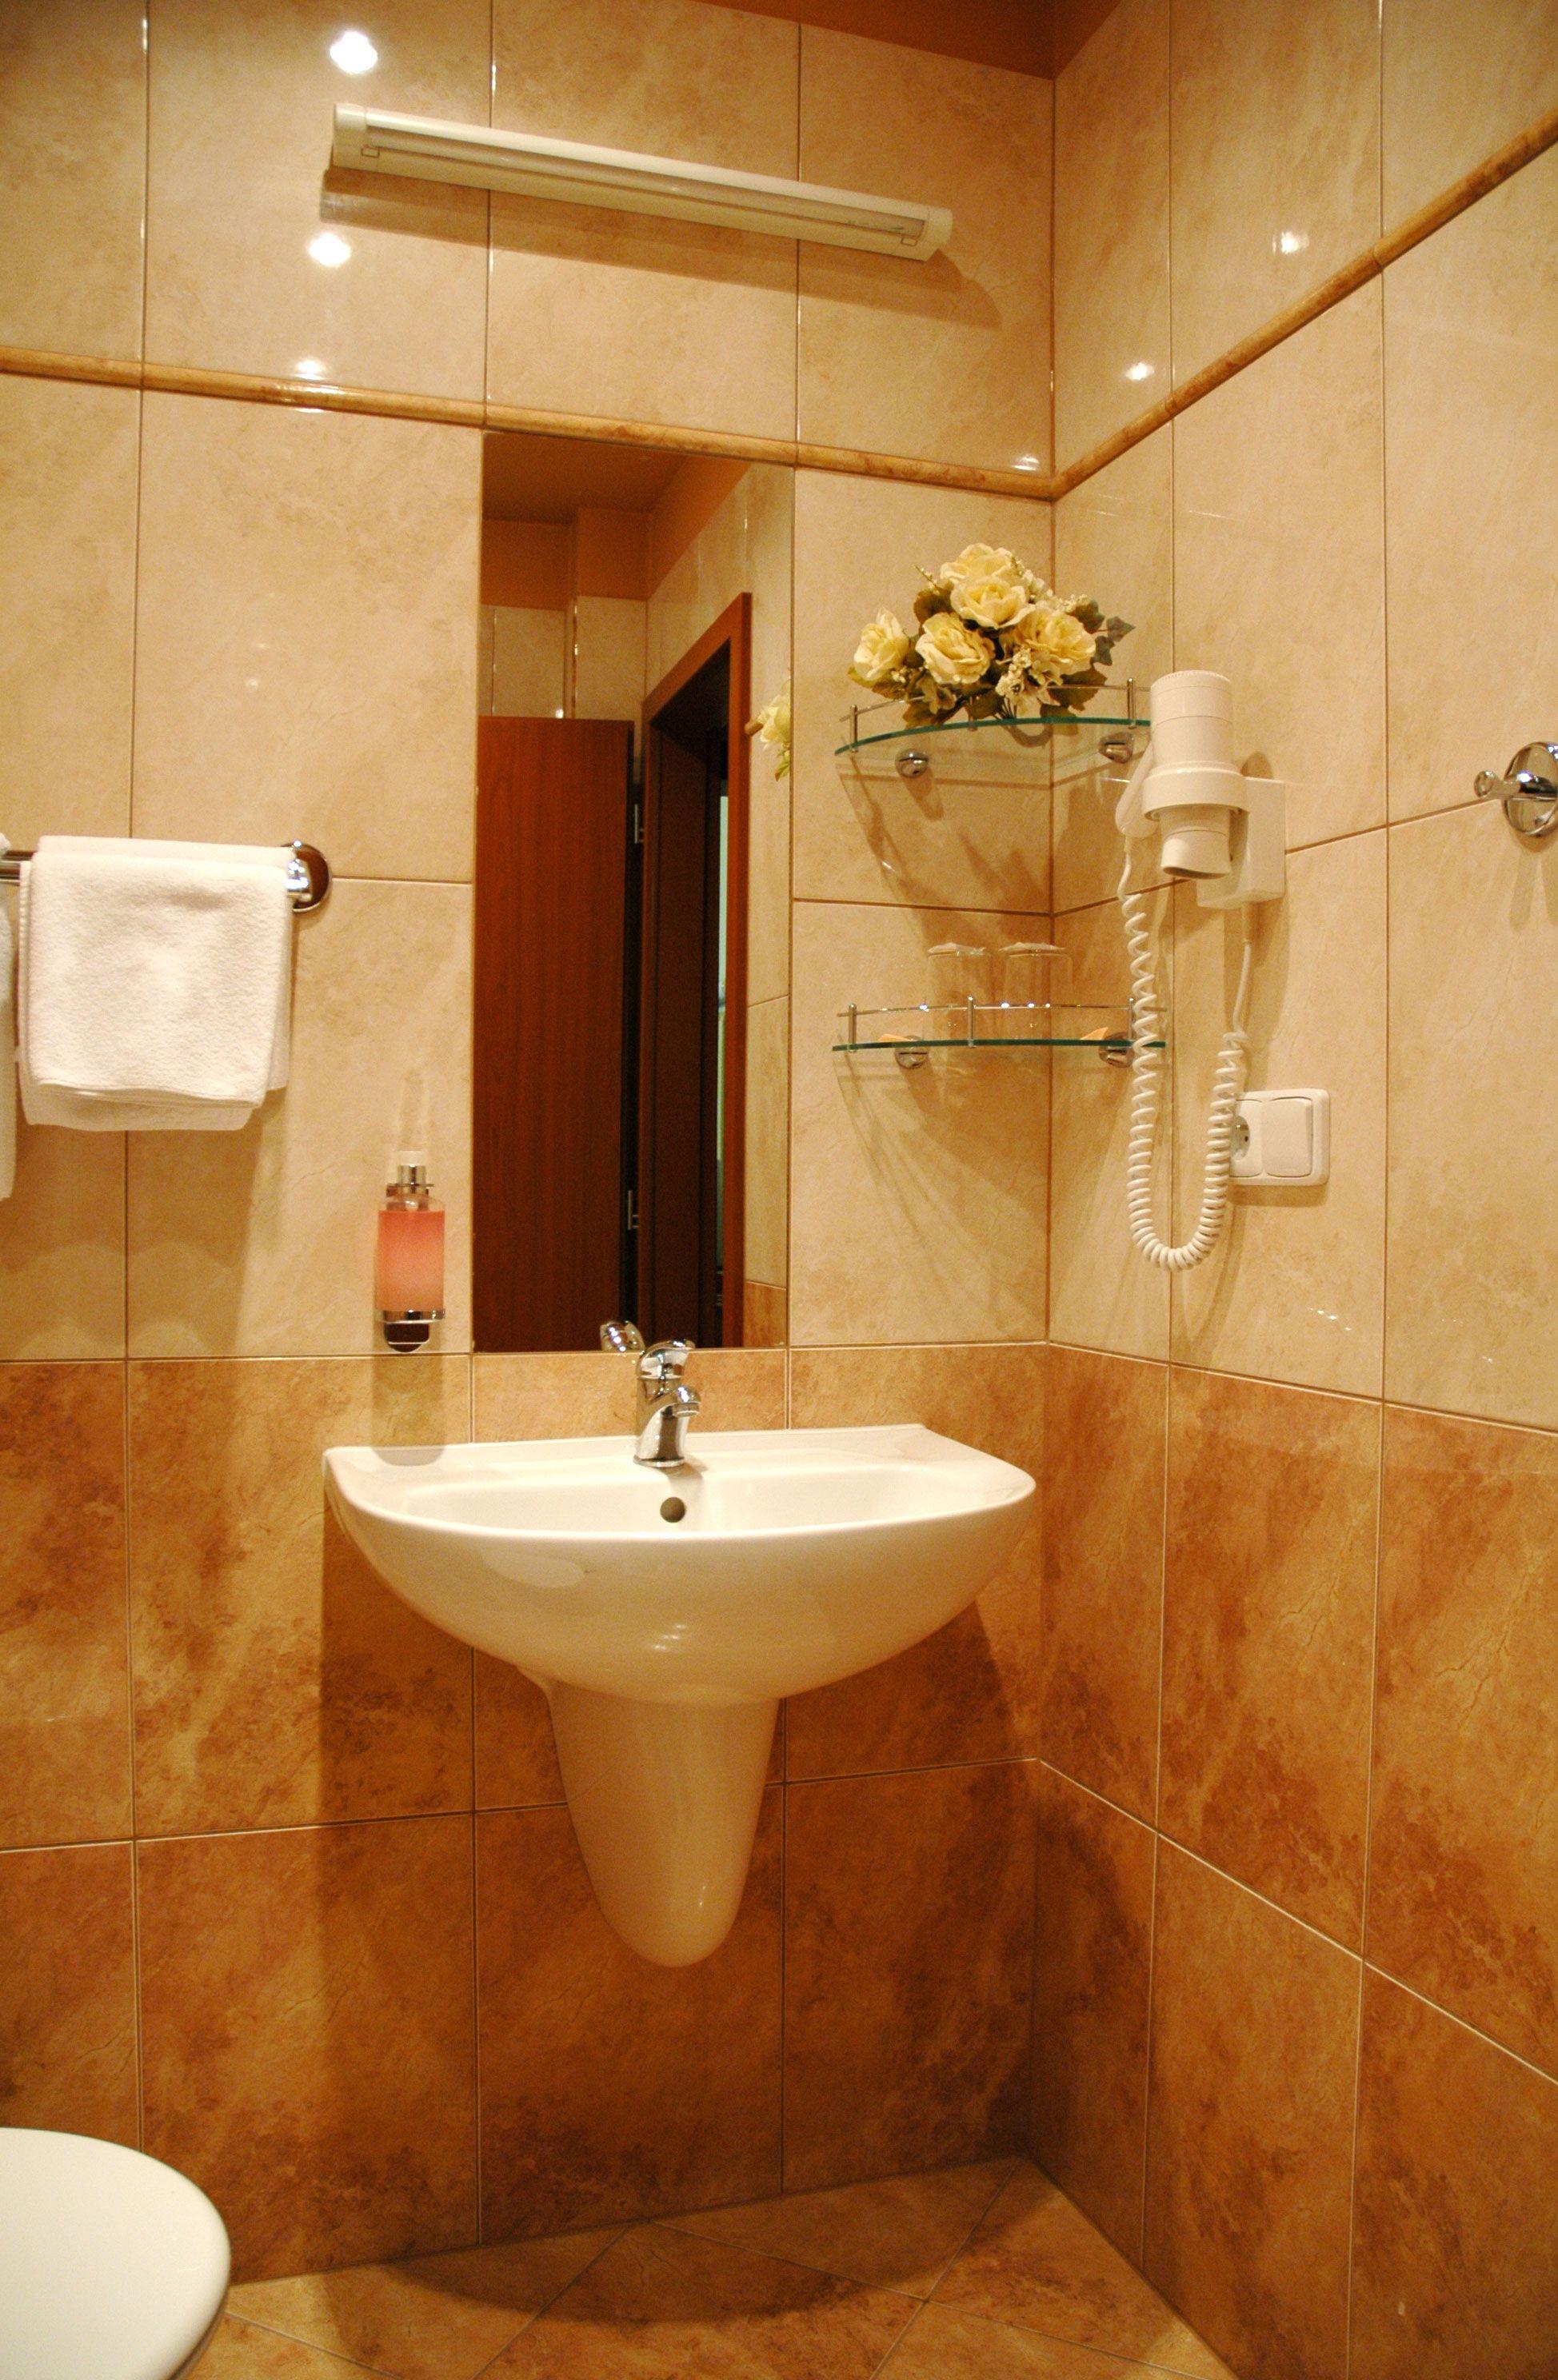 Beautiful Bathroom Designs beautiful bathroom designs small bathroom | ideas 2017-2018